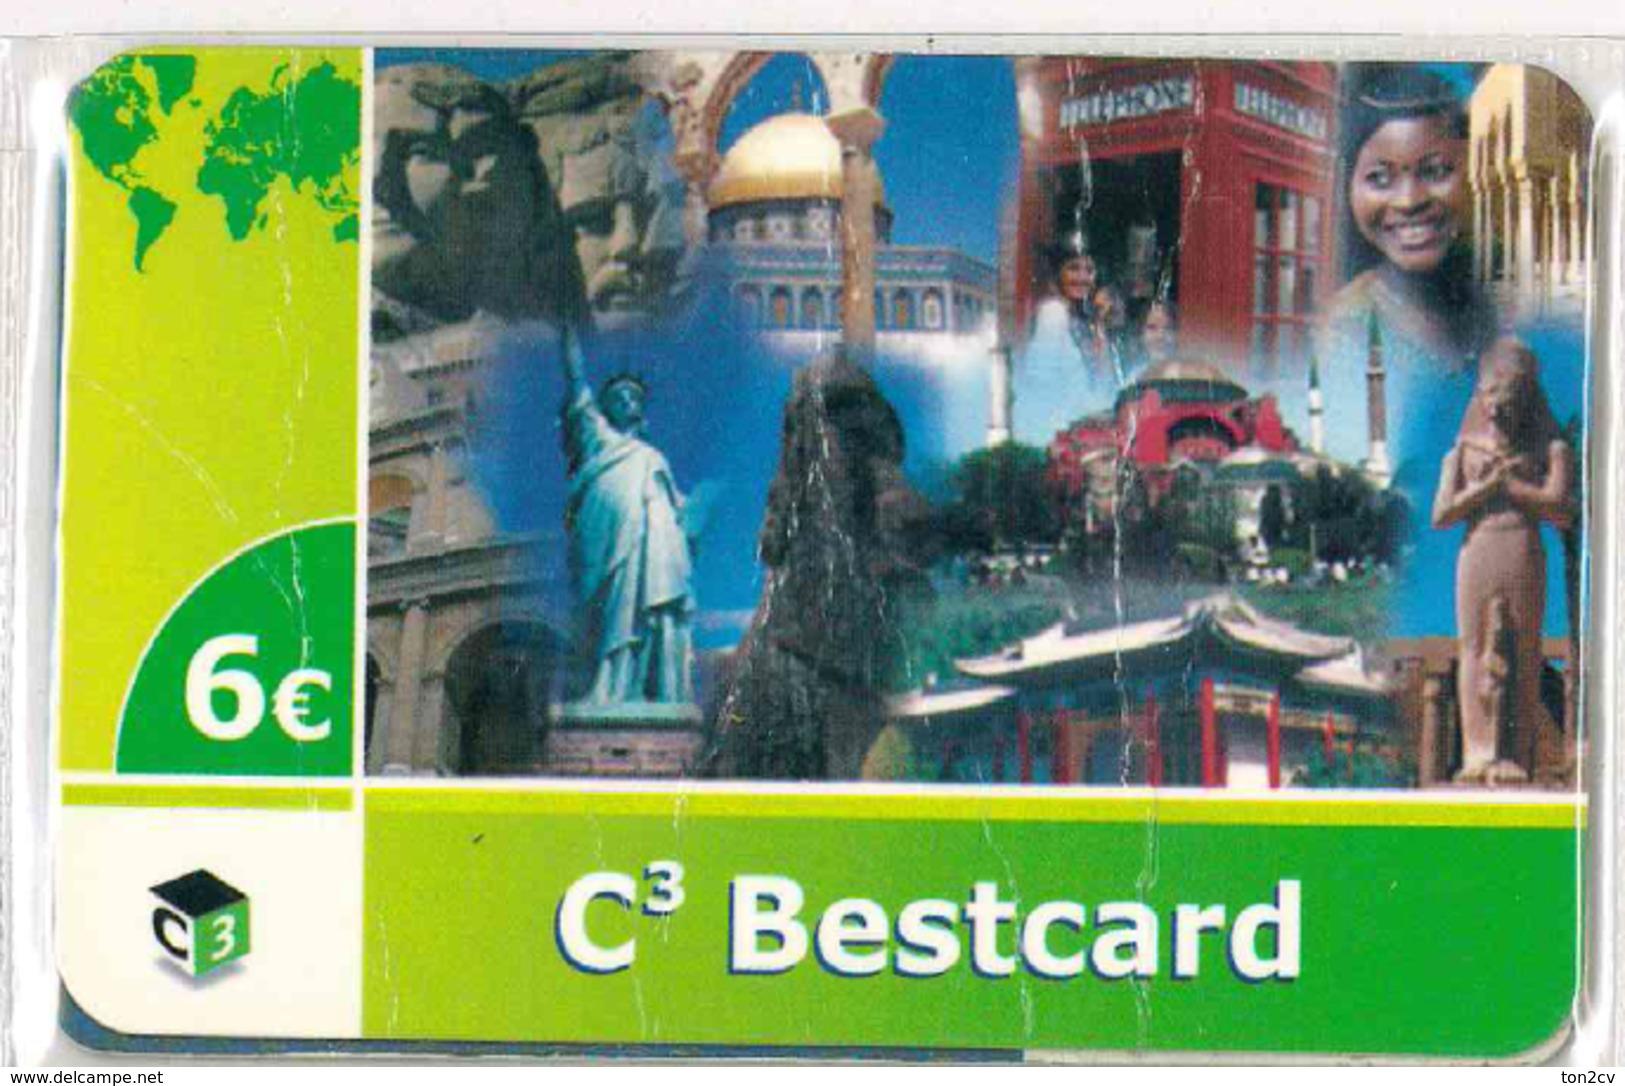 Phonecard - BESTCARD - Telefonkarten